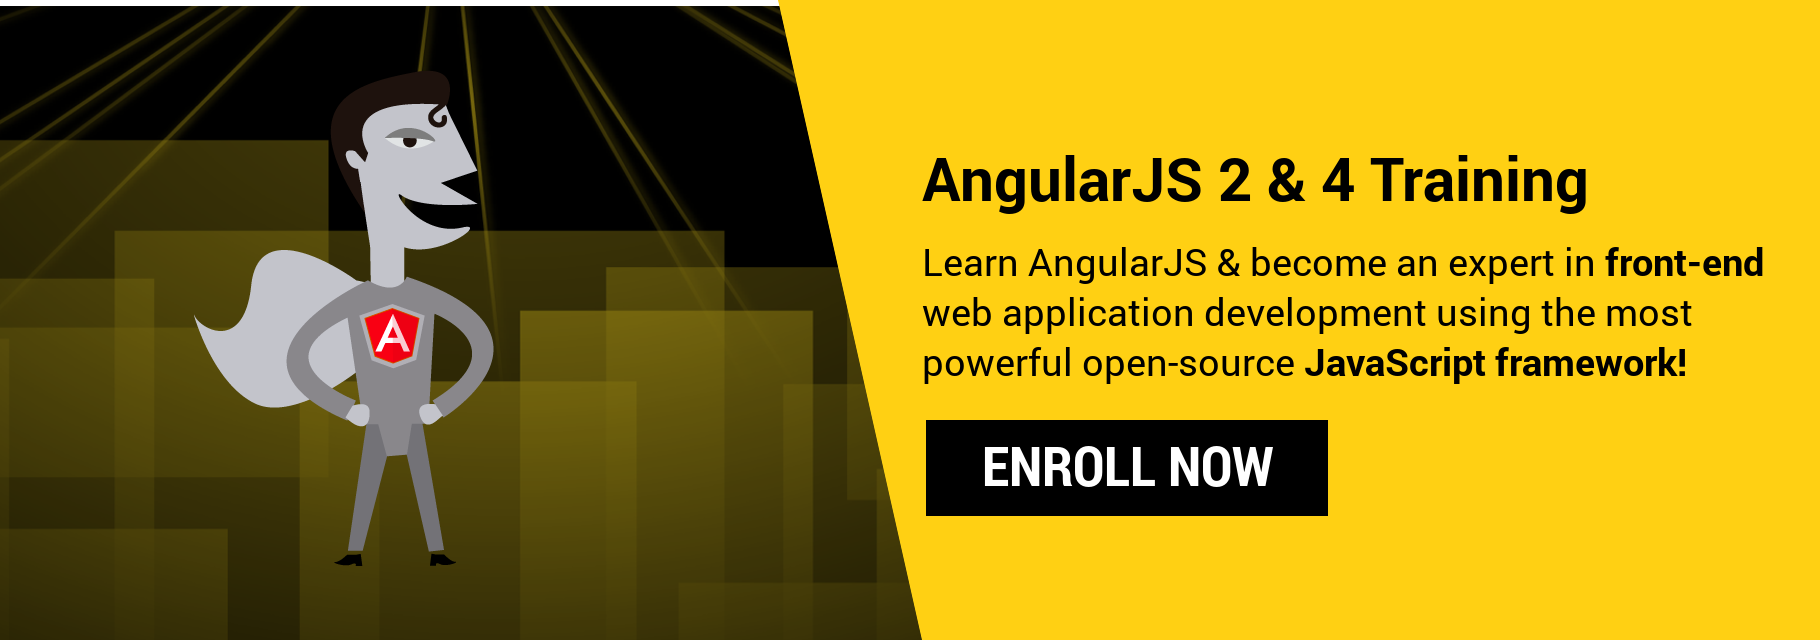 Learn AngularJS 2 & 4